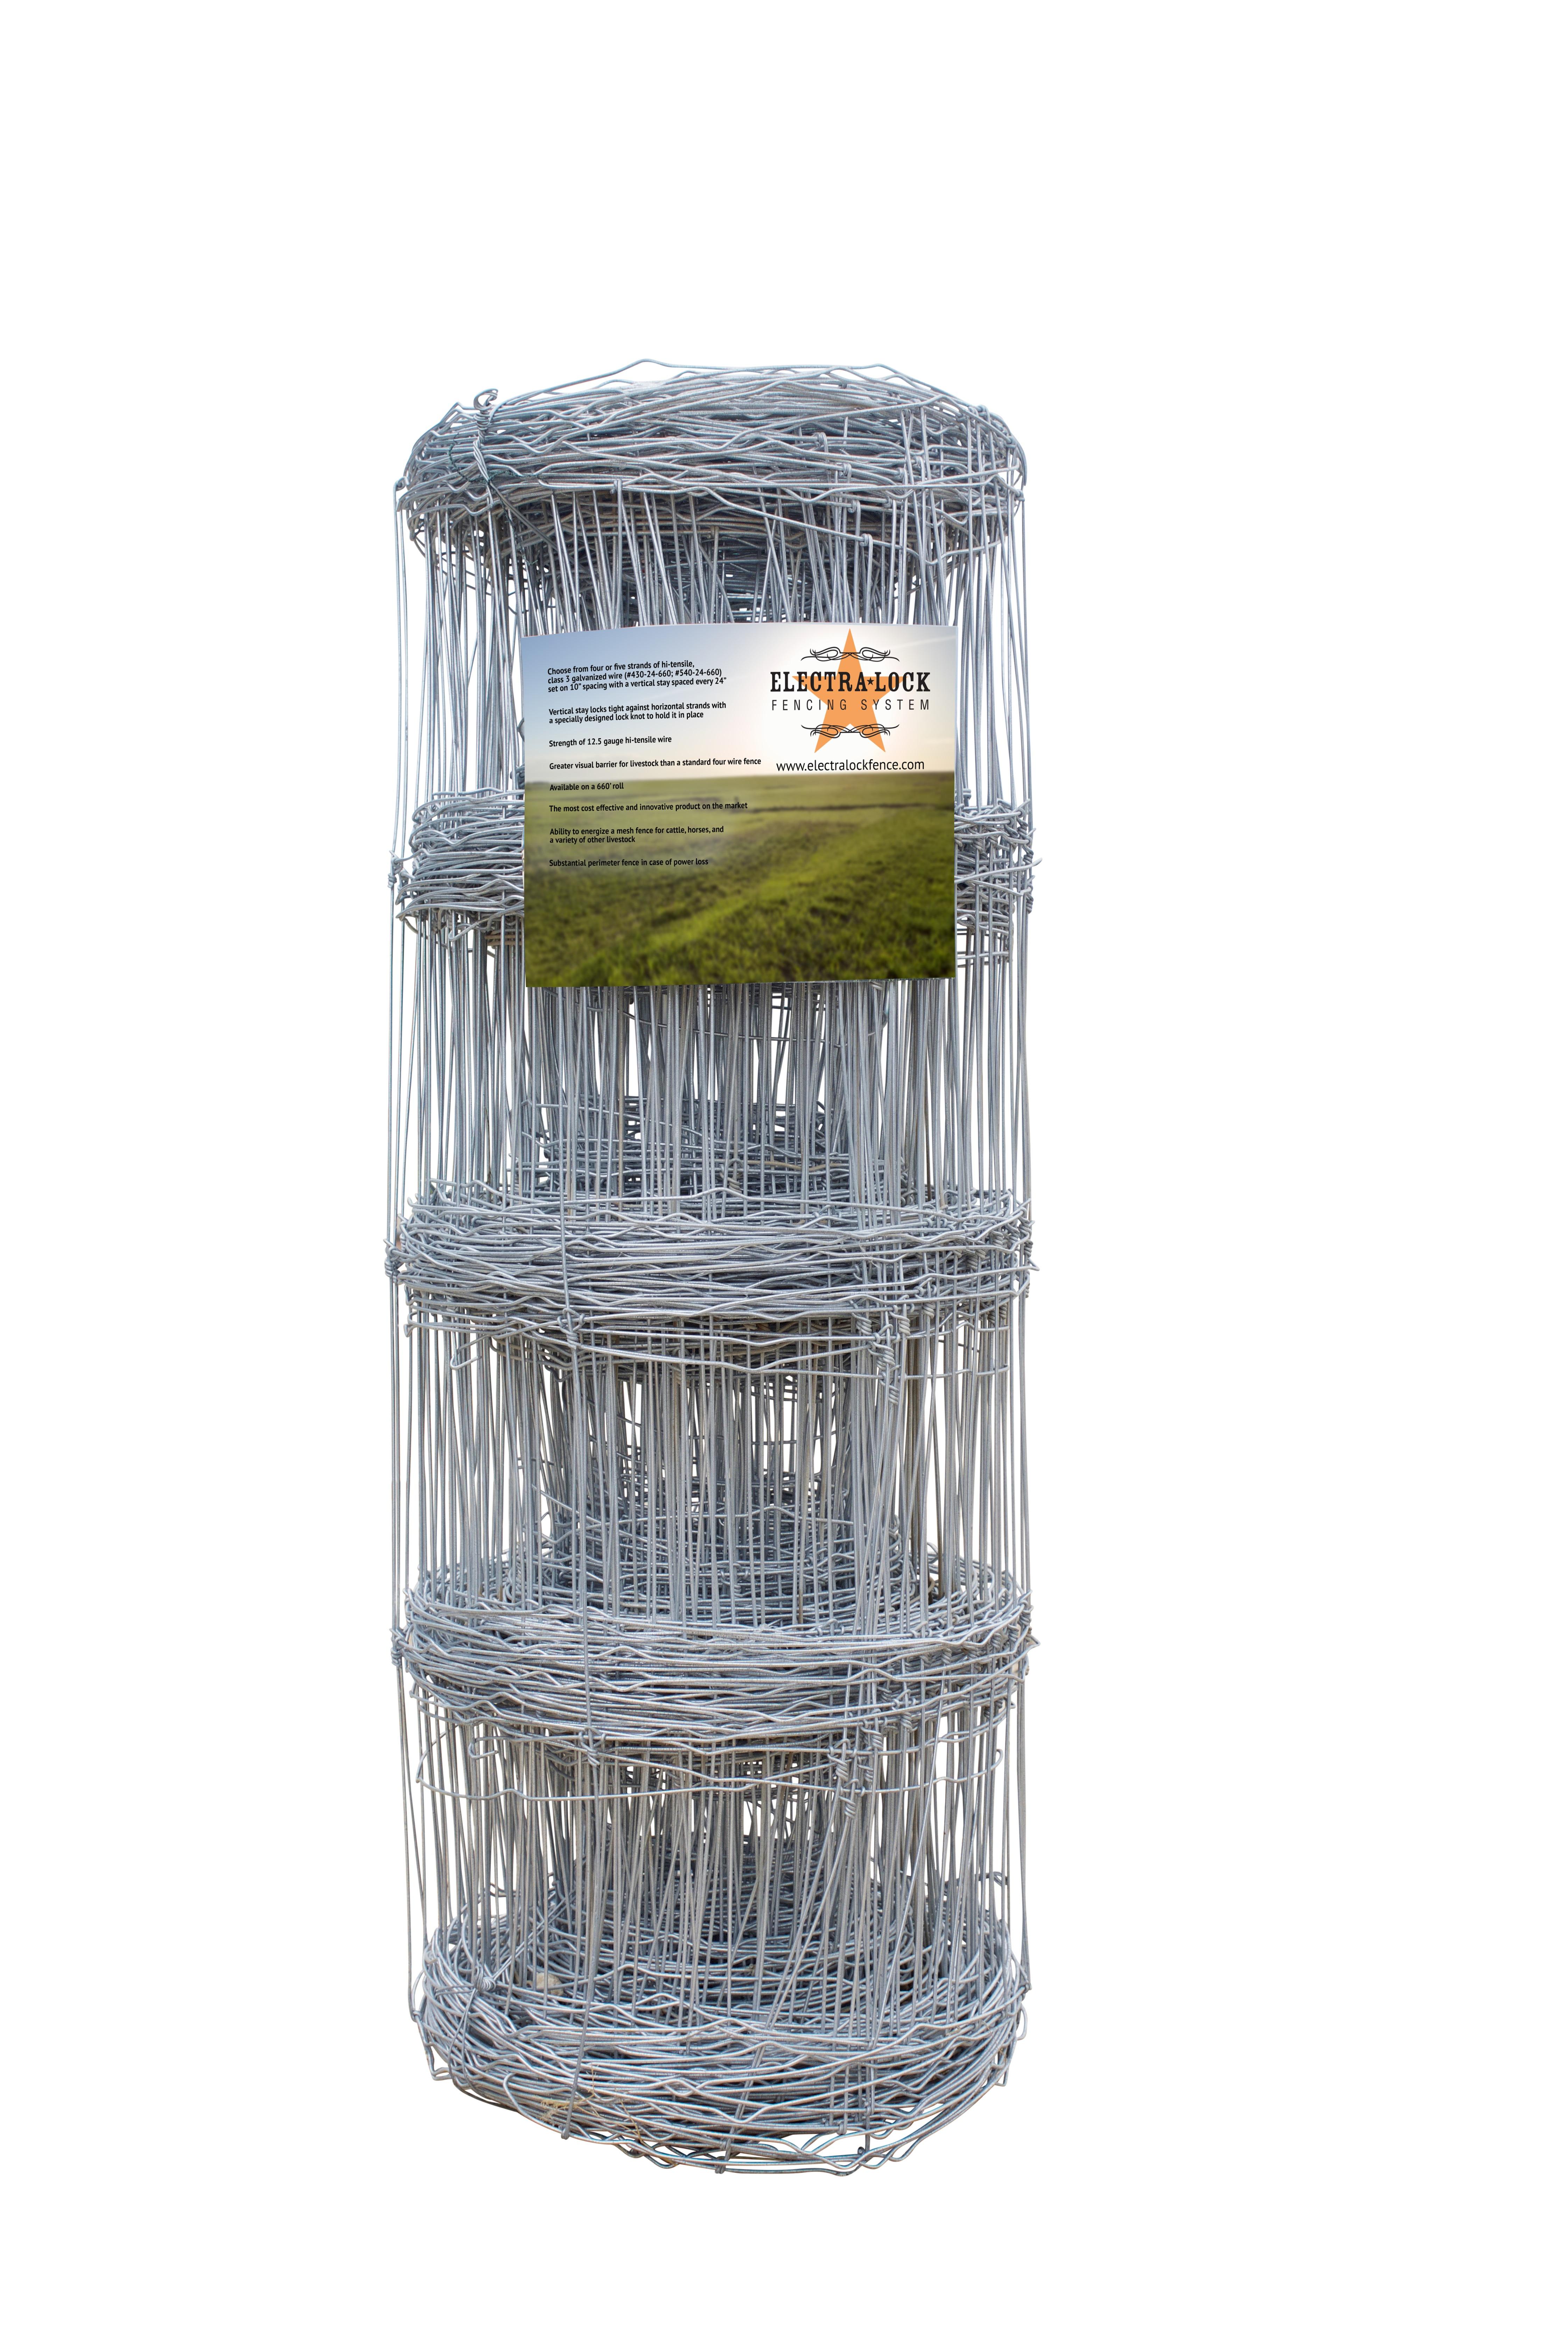 4-Strand Electra-Lock Fence Wire